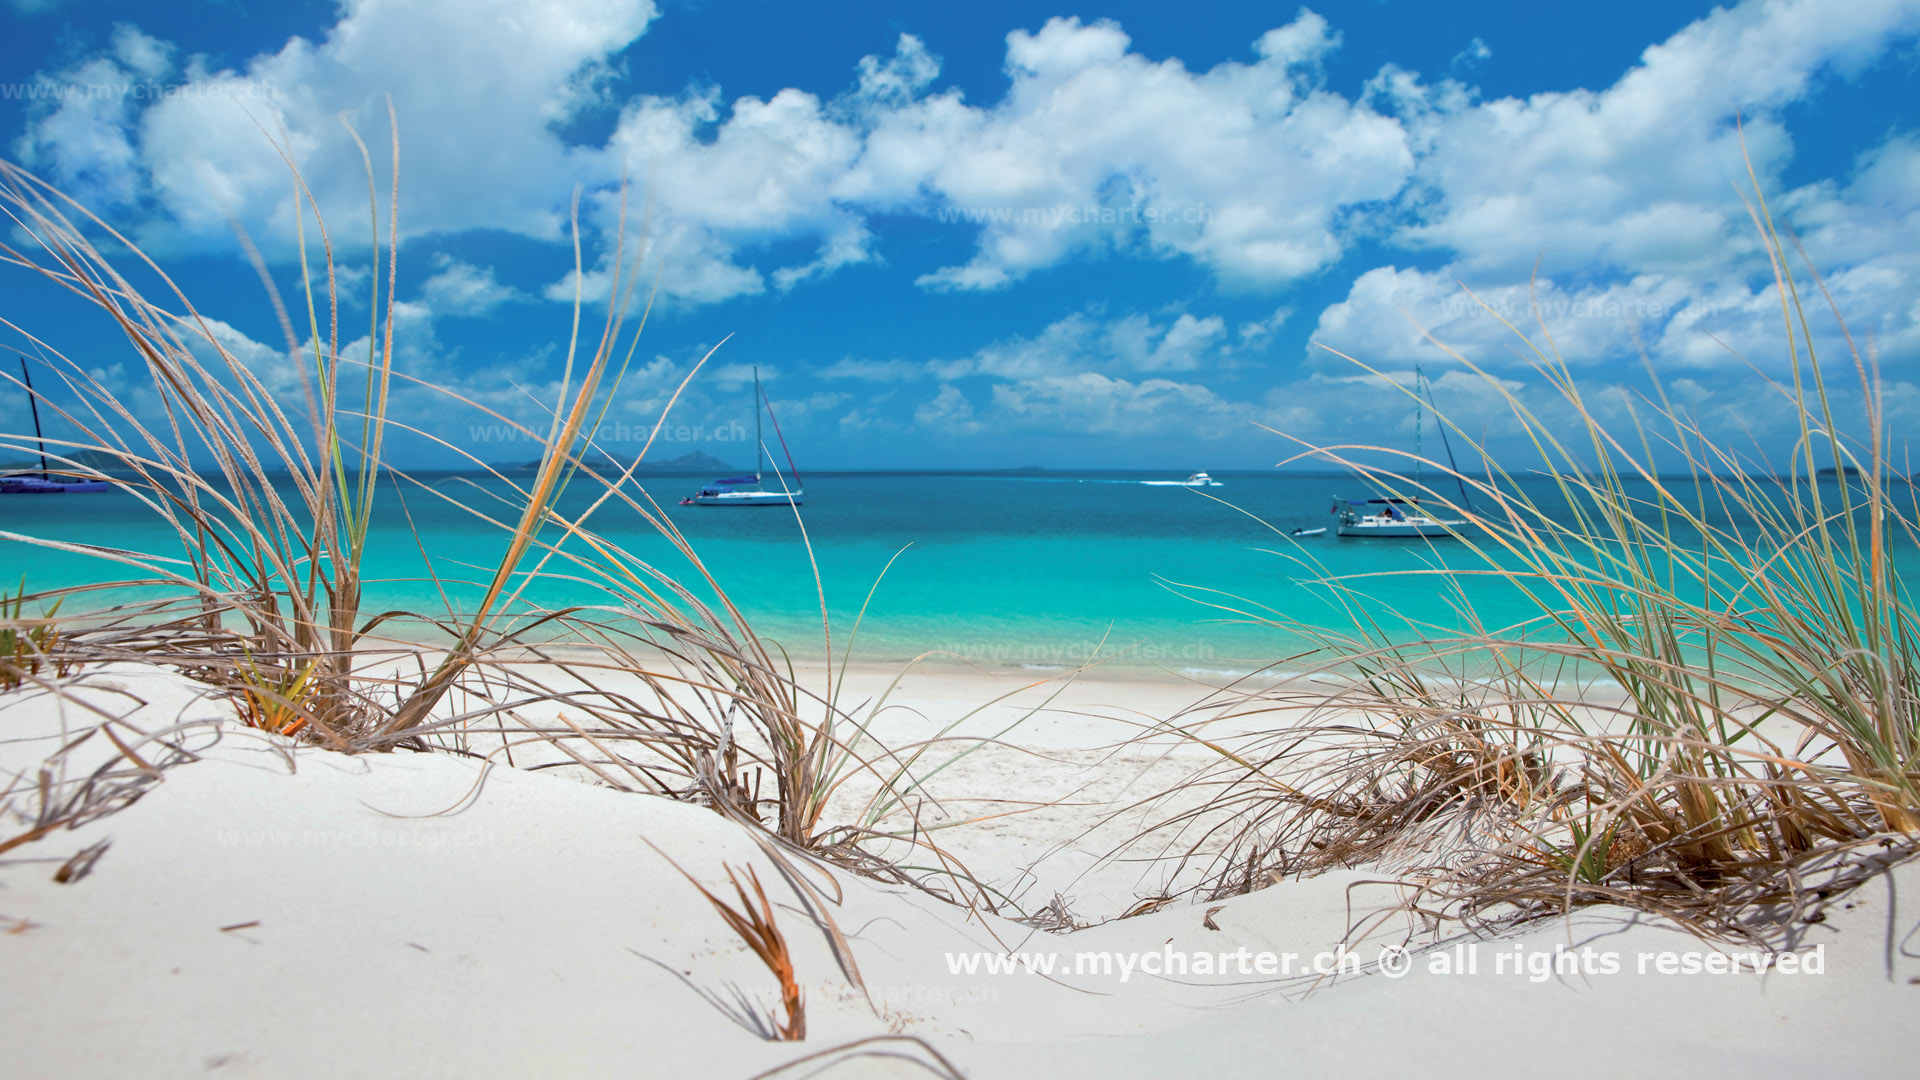 Toern Australien - Whitehaven Beach